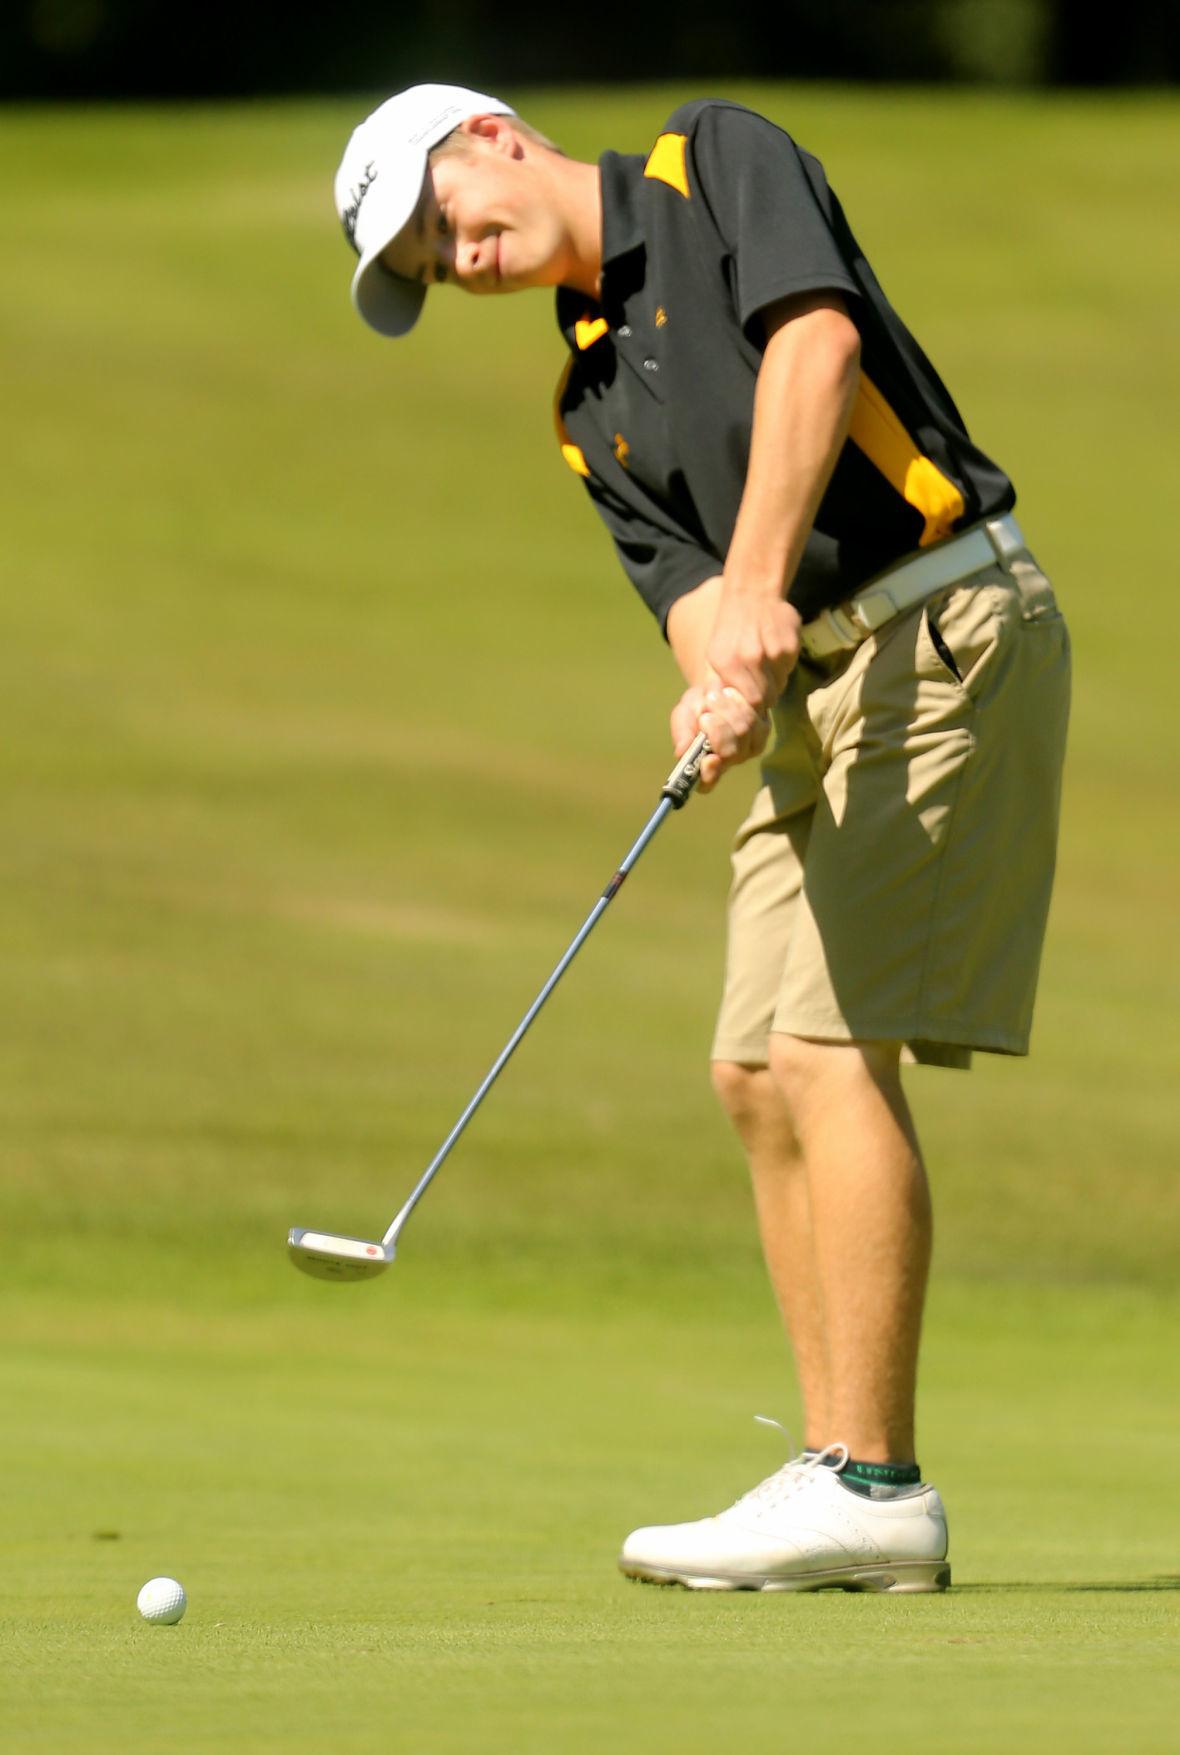 091118-spt-boys-golf-002